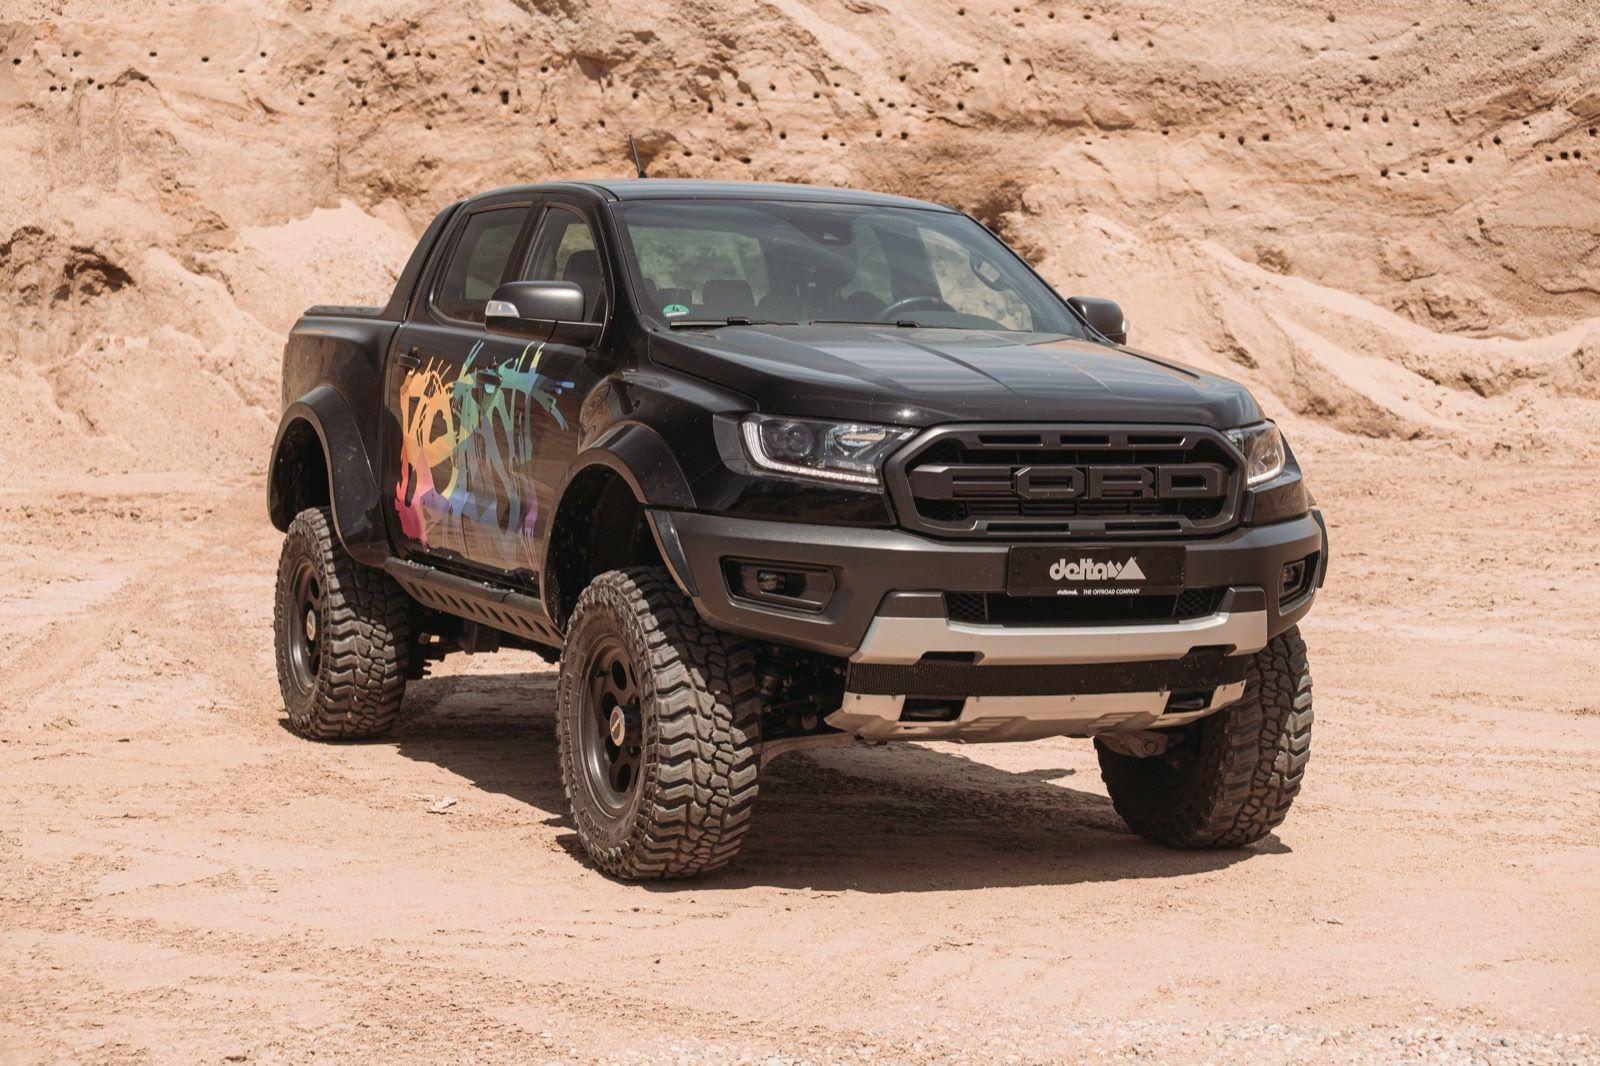 Ford-Ranger-Raptor-by-Delta-4x4-2